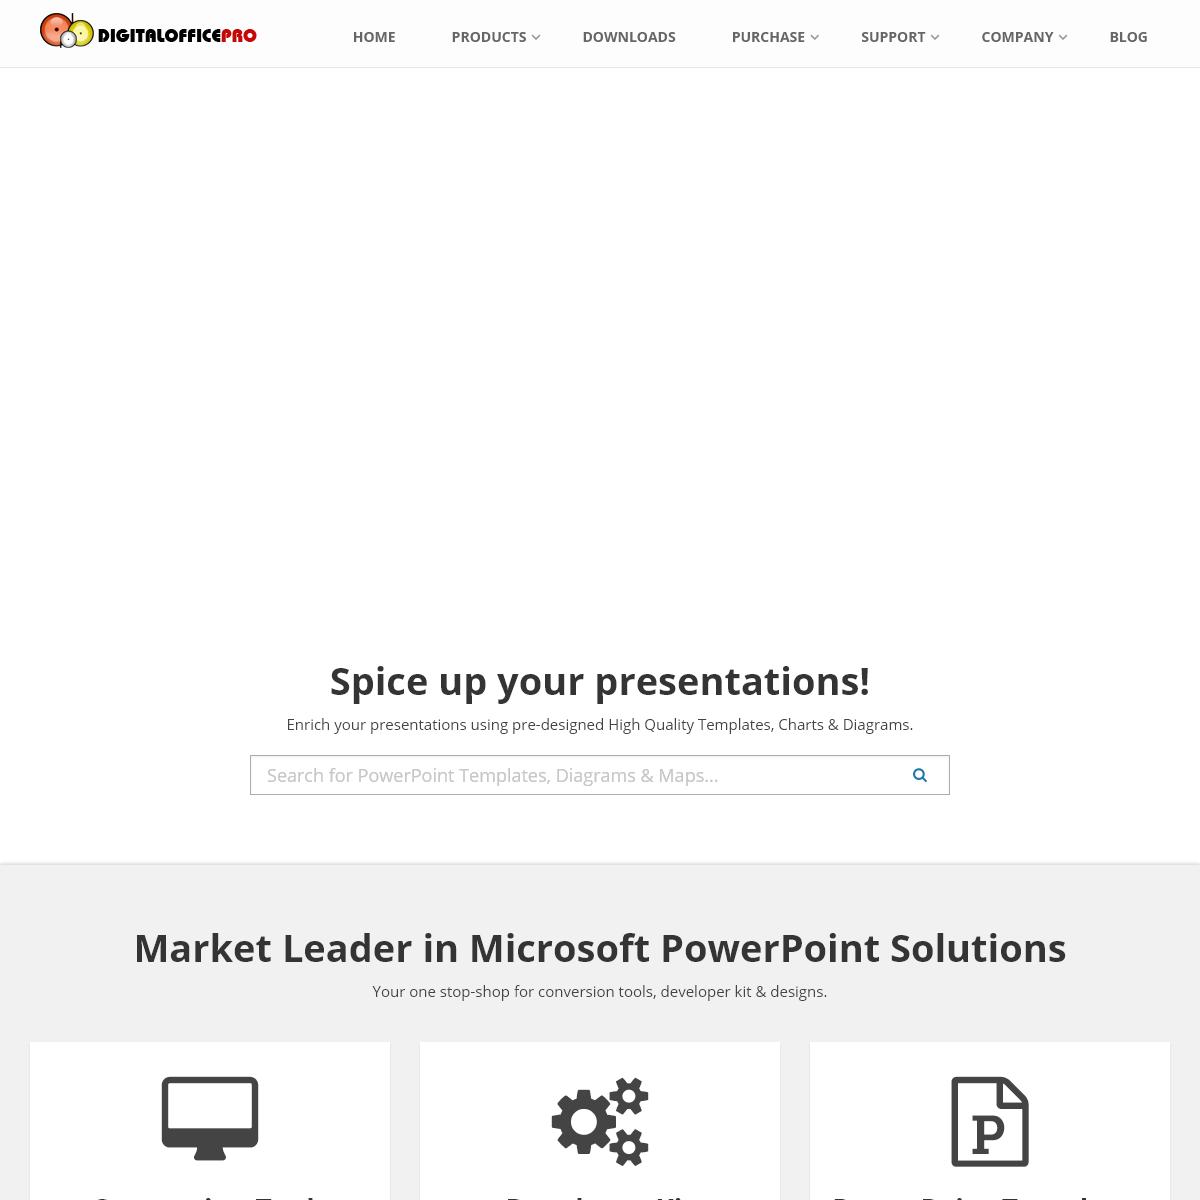 DigitalOfficePro - Conversion Tools, Developer Kit, Powerpoint Templates, eLearning Tools